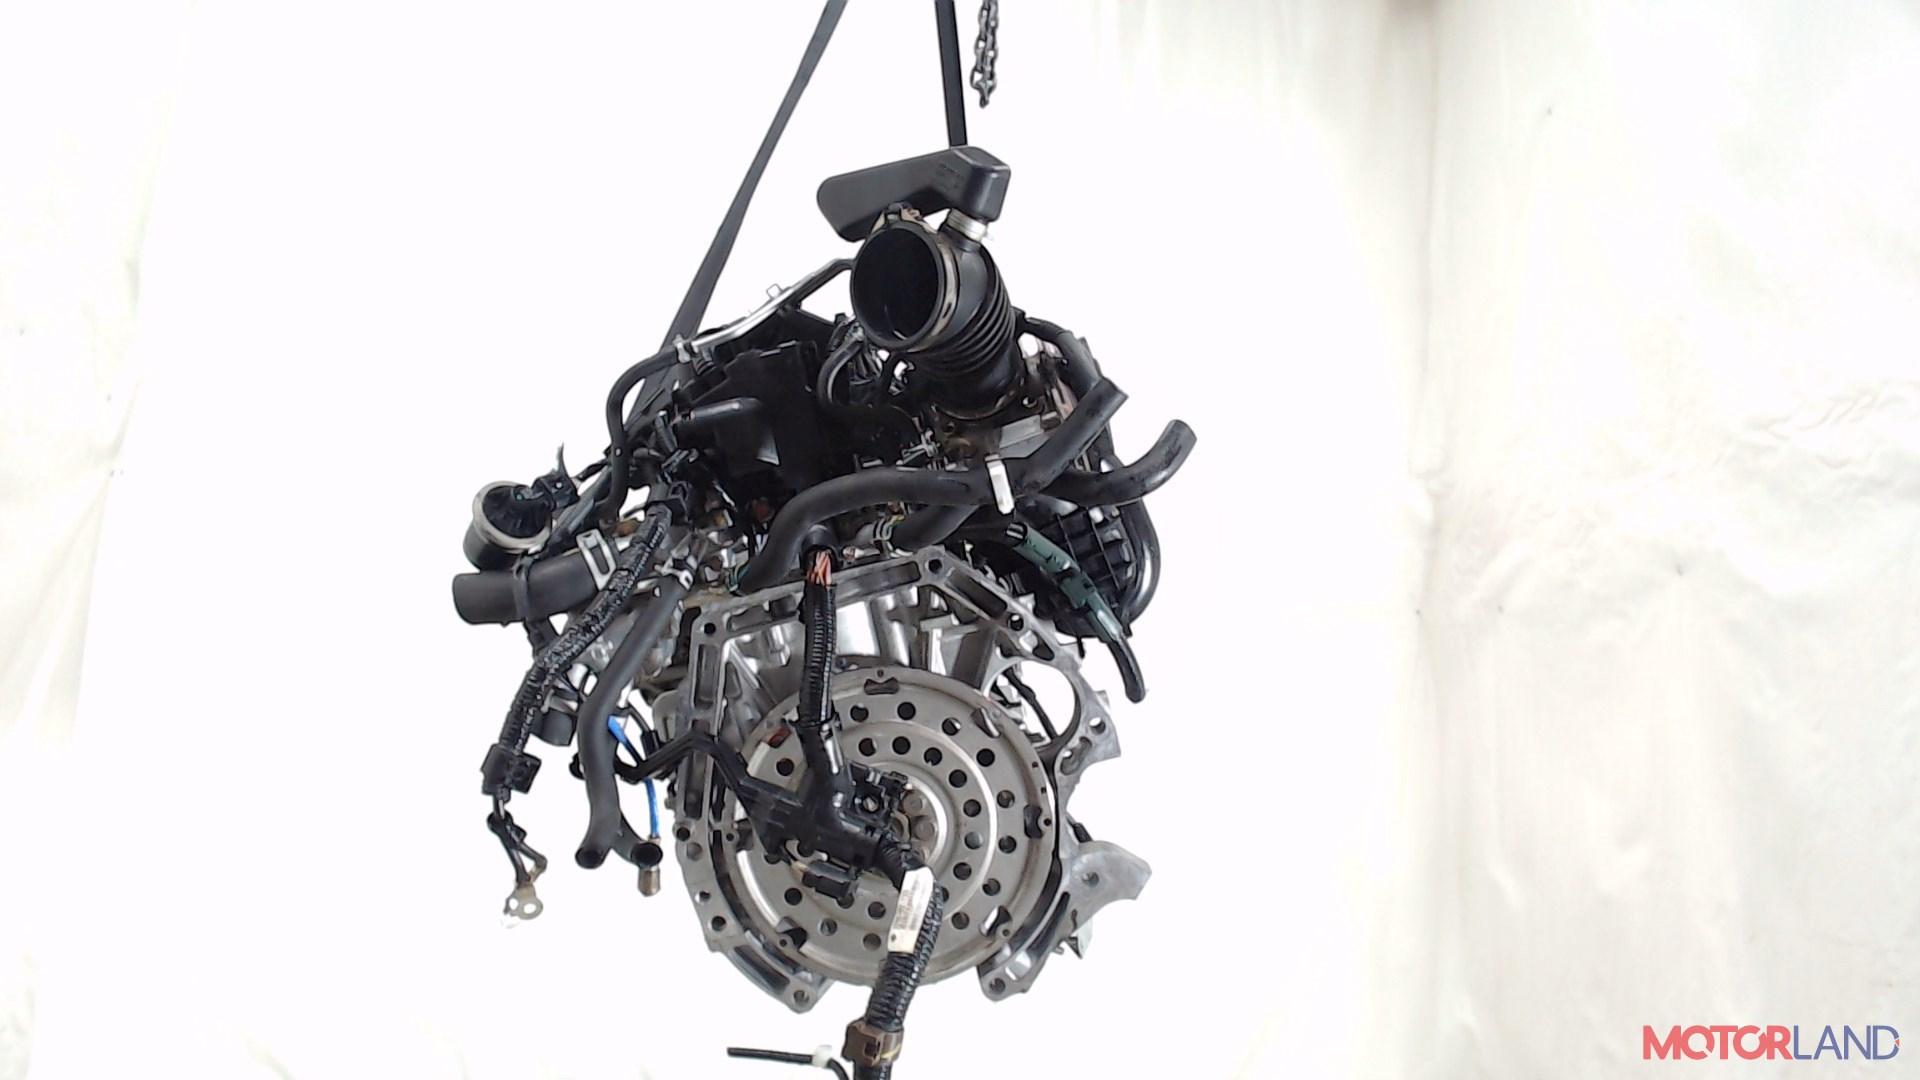 Двигатель Honda HRV 2015-, 1.8 литра, бензин, инжектор, r18zf, Артикул 4592664 #1